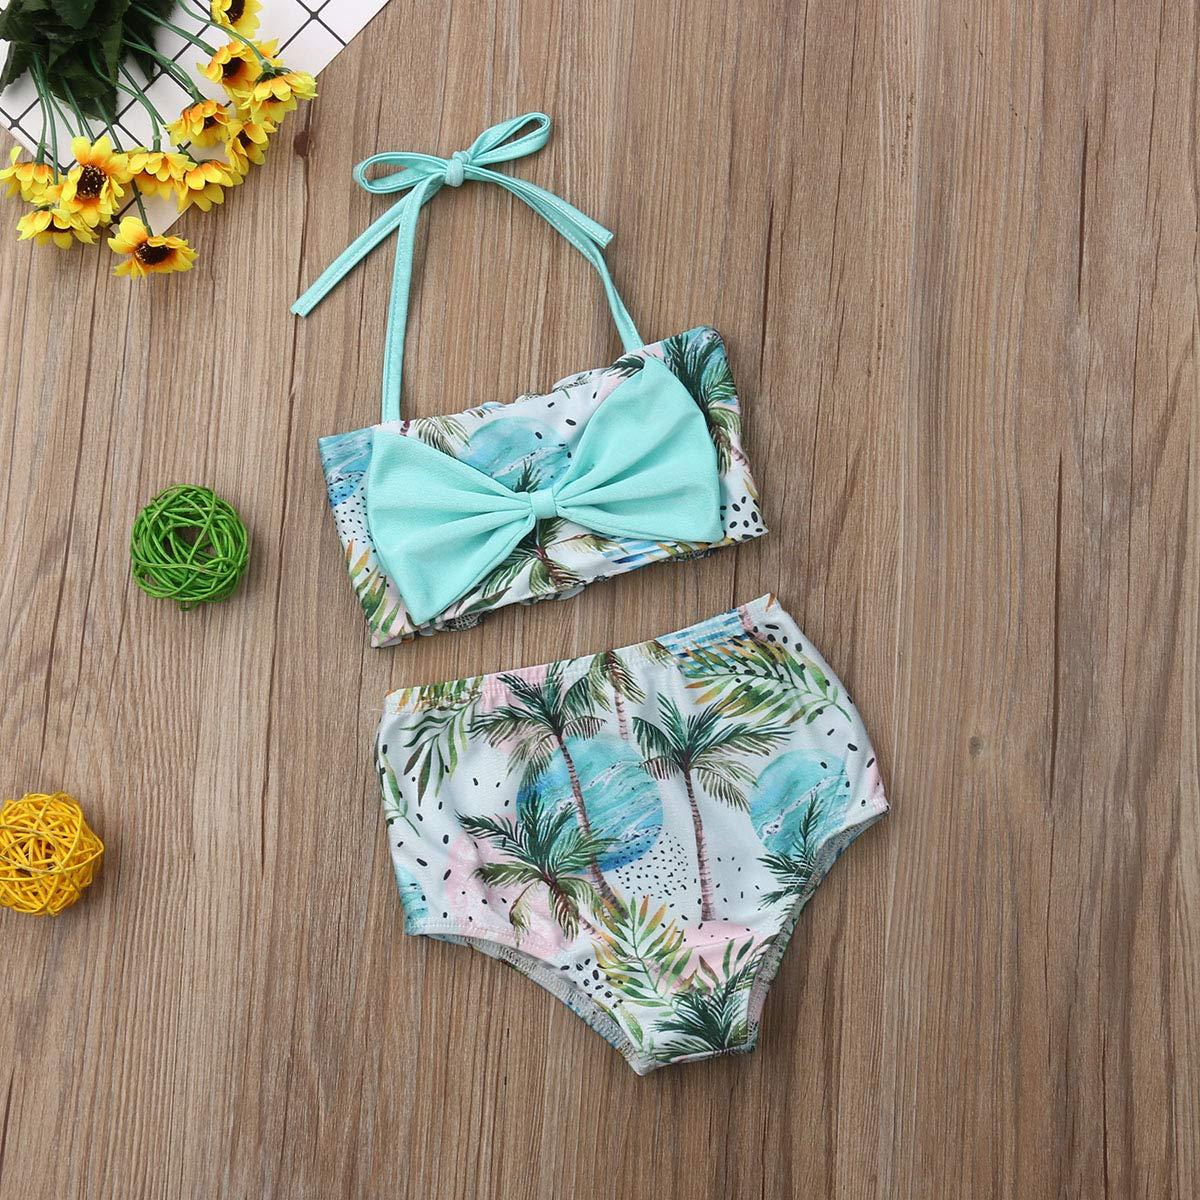 Baby Girls Plaid Swimwear Sunsuits Two Pieces Blue Bikini Bathing Sets Swimsuit